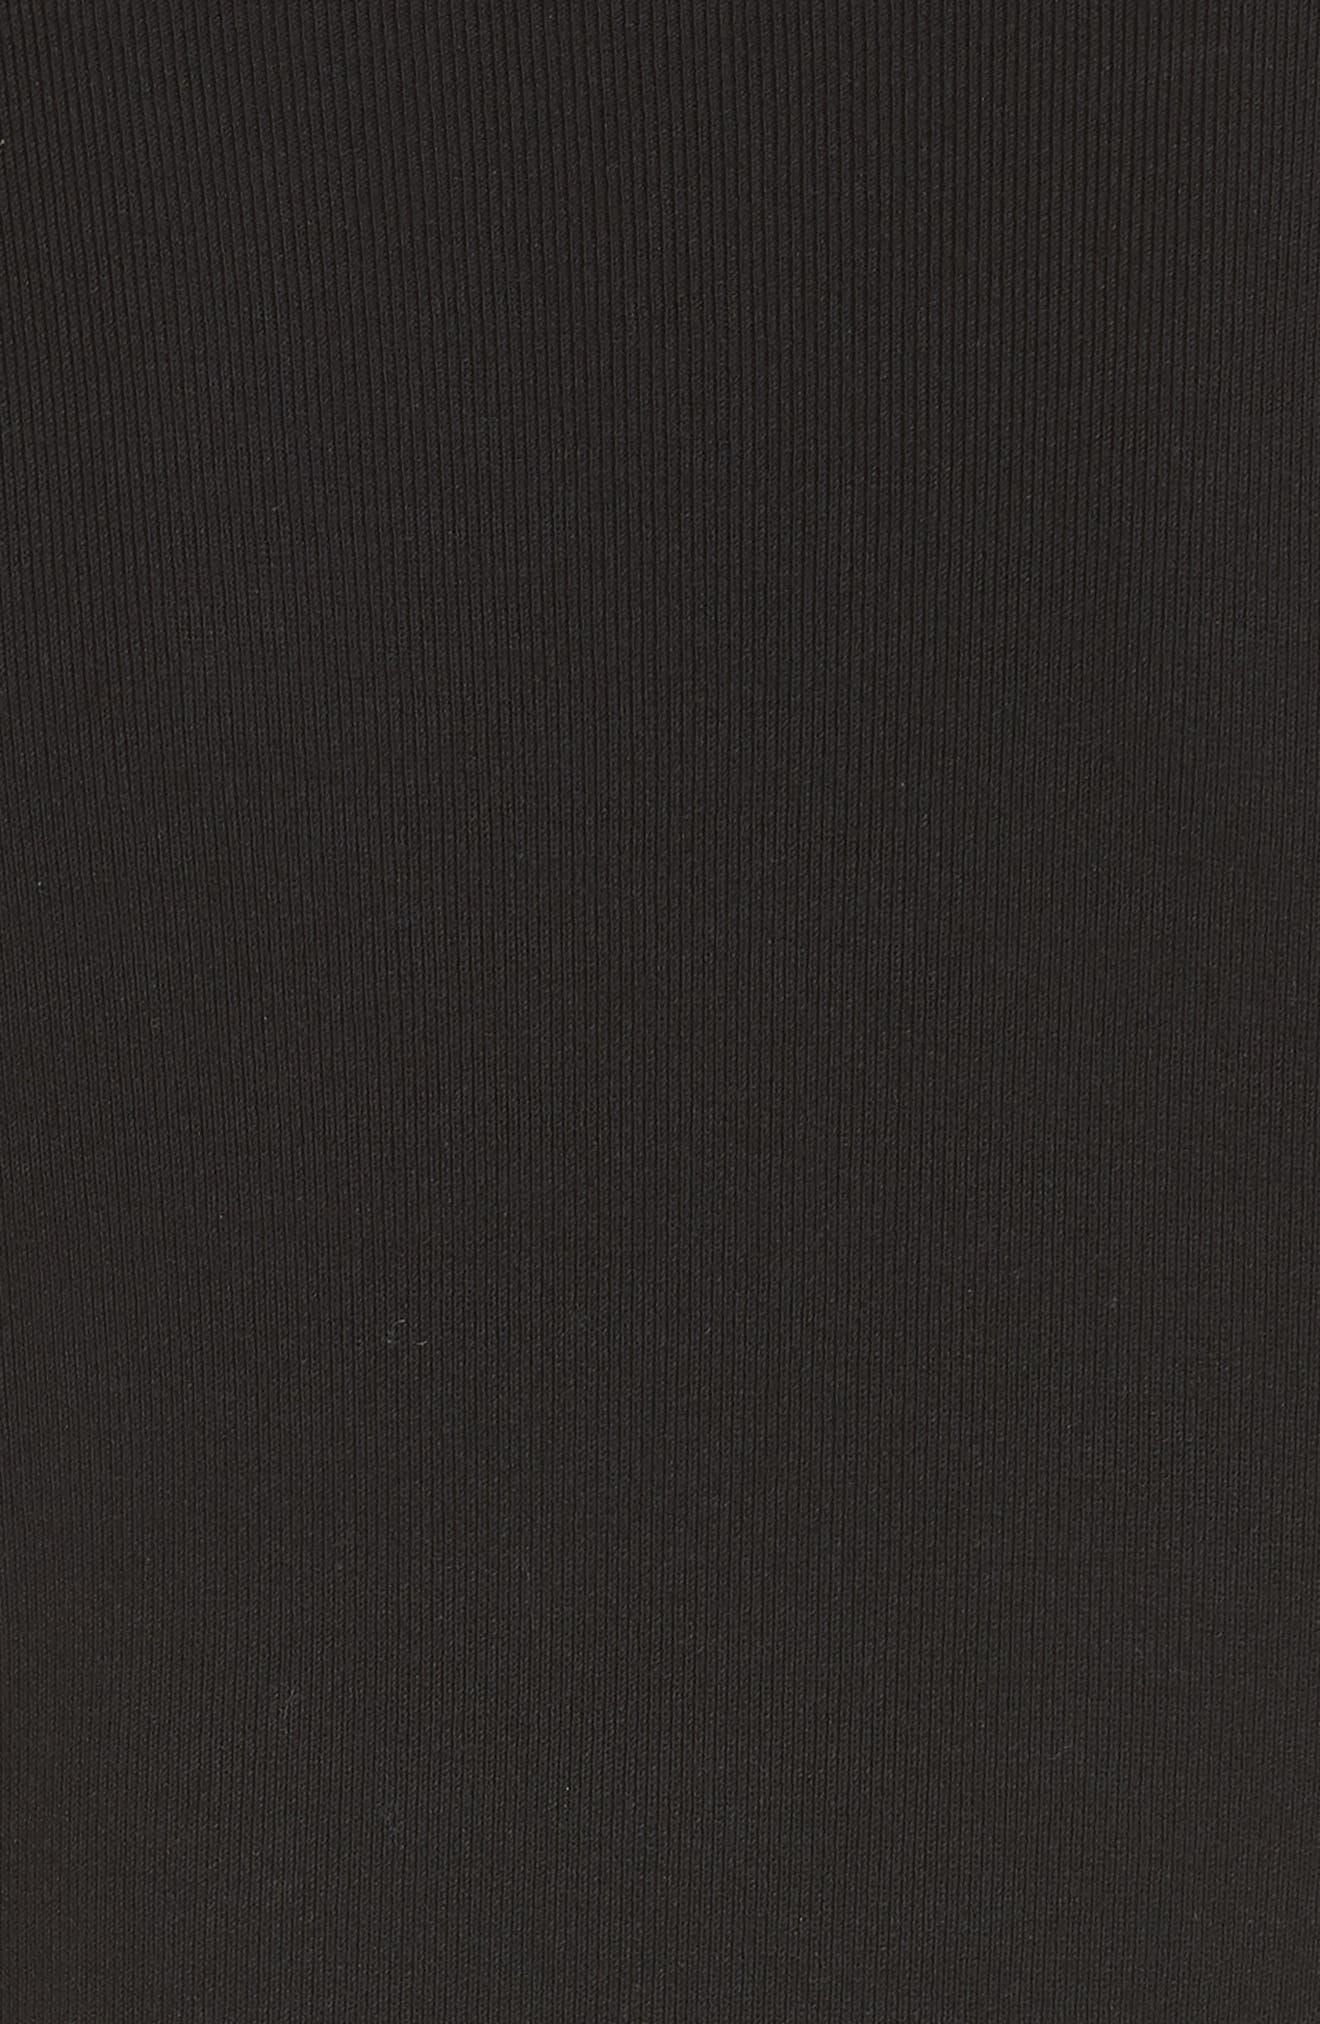 Nilimary Prosecco Midi Dress,                             Alternate thumbnail 5, color,                             Black